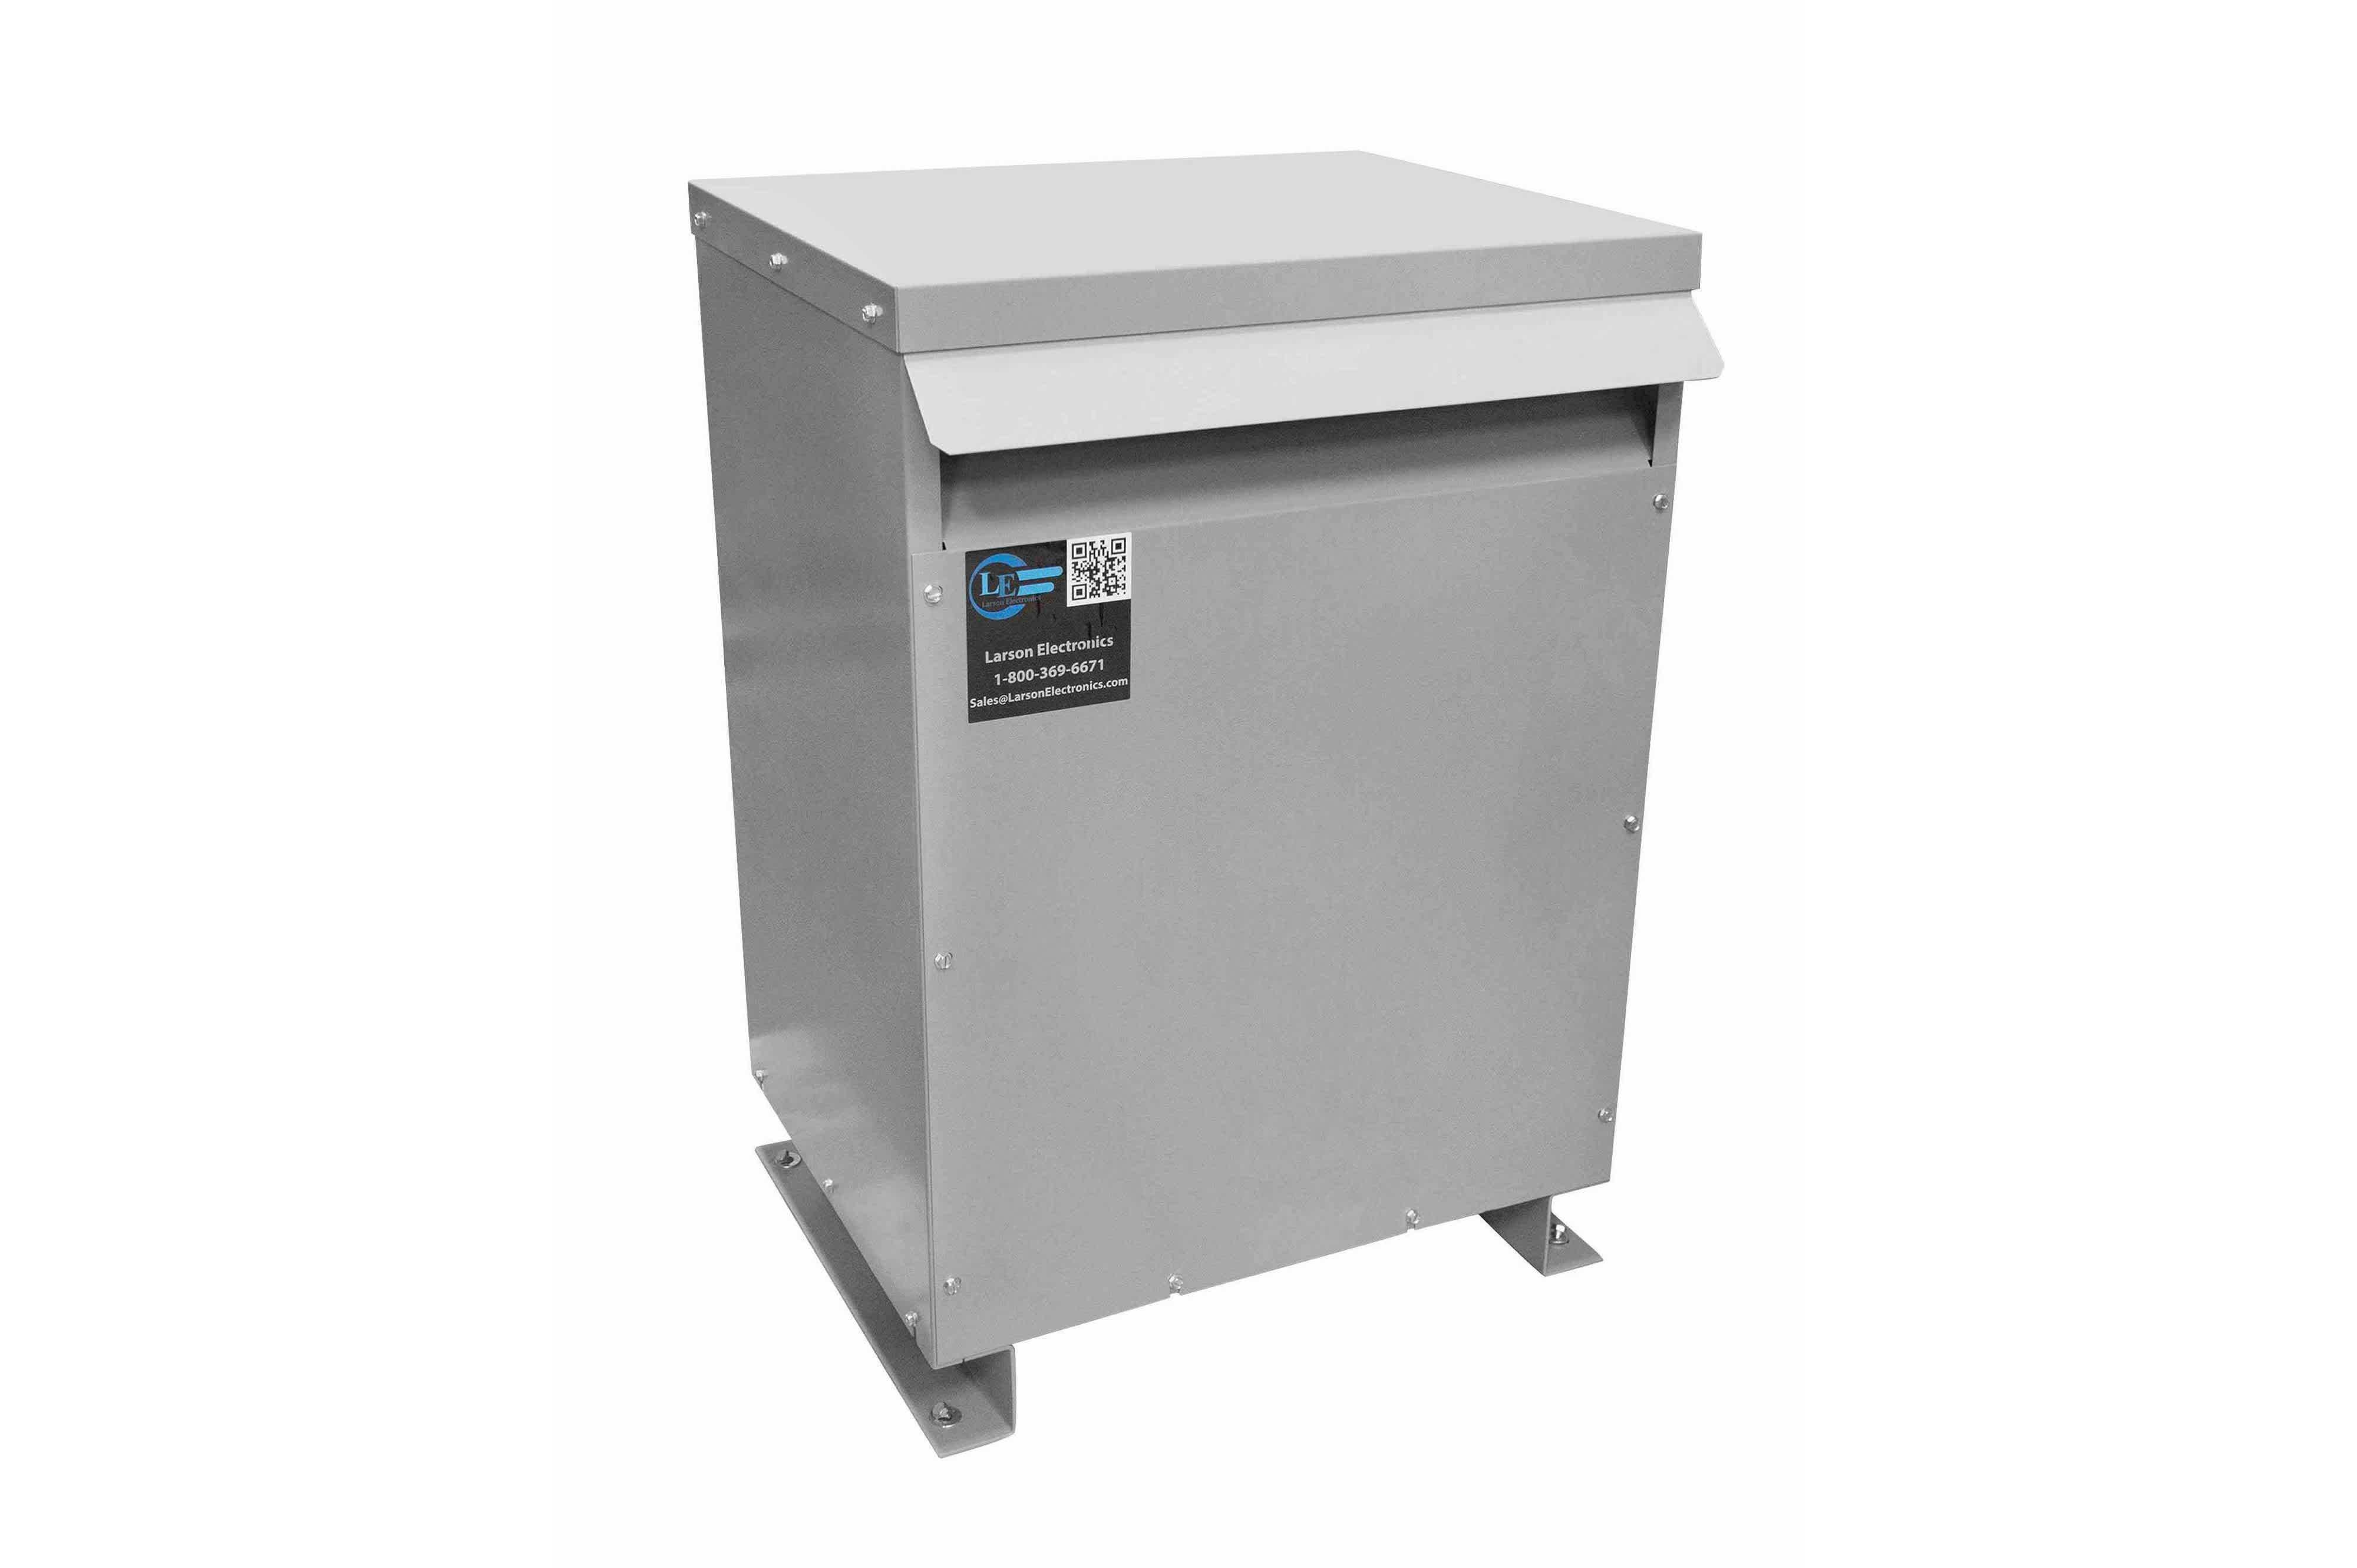 225 kVA 3PH Isolation Transformer, 600V Wye Primary, 400V Delta Secondary, N3R, Ventilated, 60 Hz